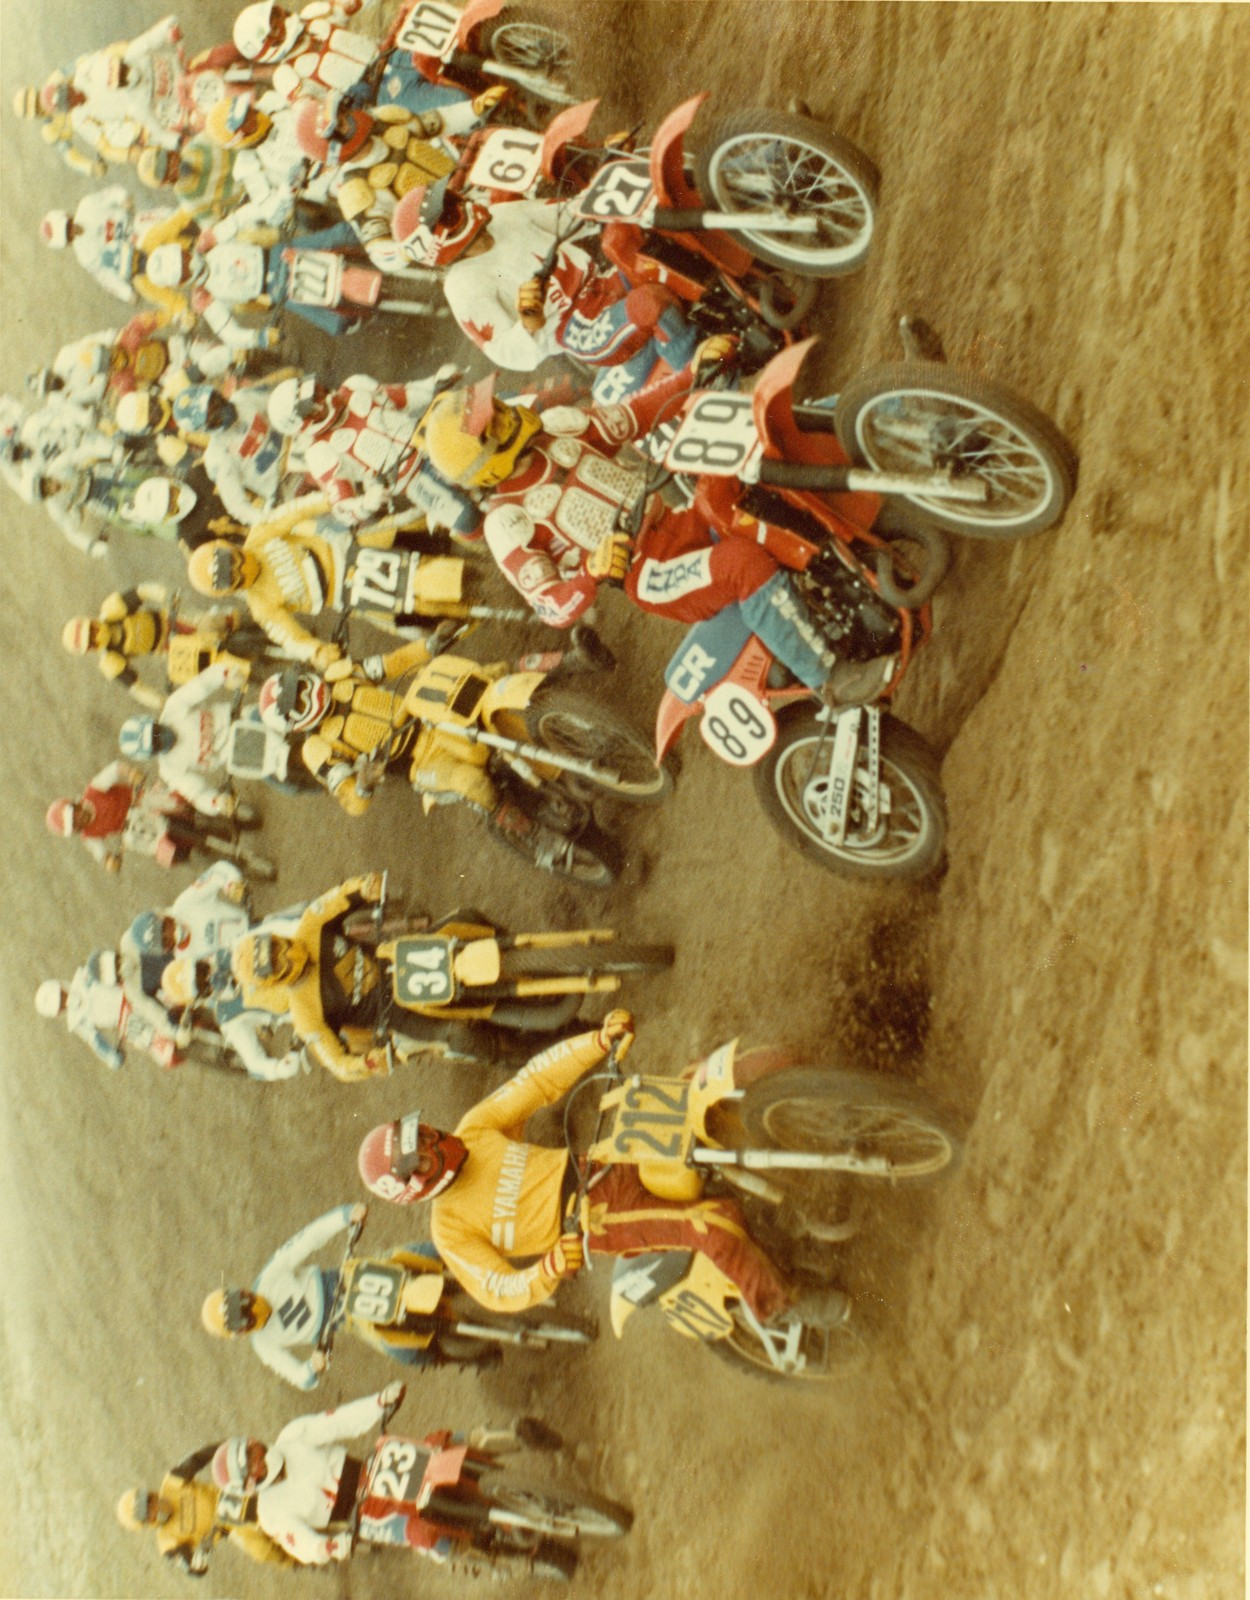 St Pete 19820001 - BVS40FL - Motocross Pictures - Vital MX